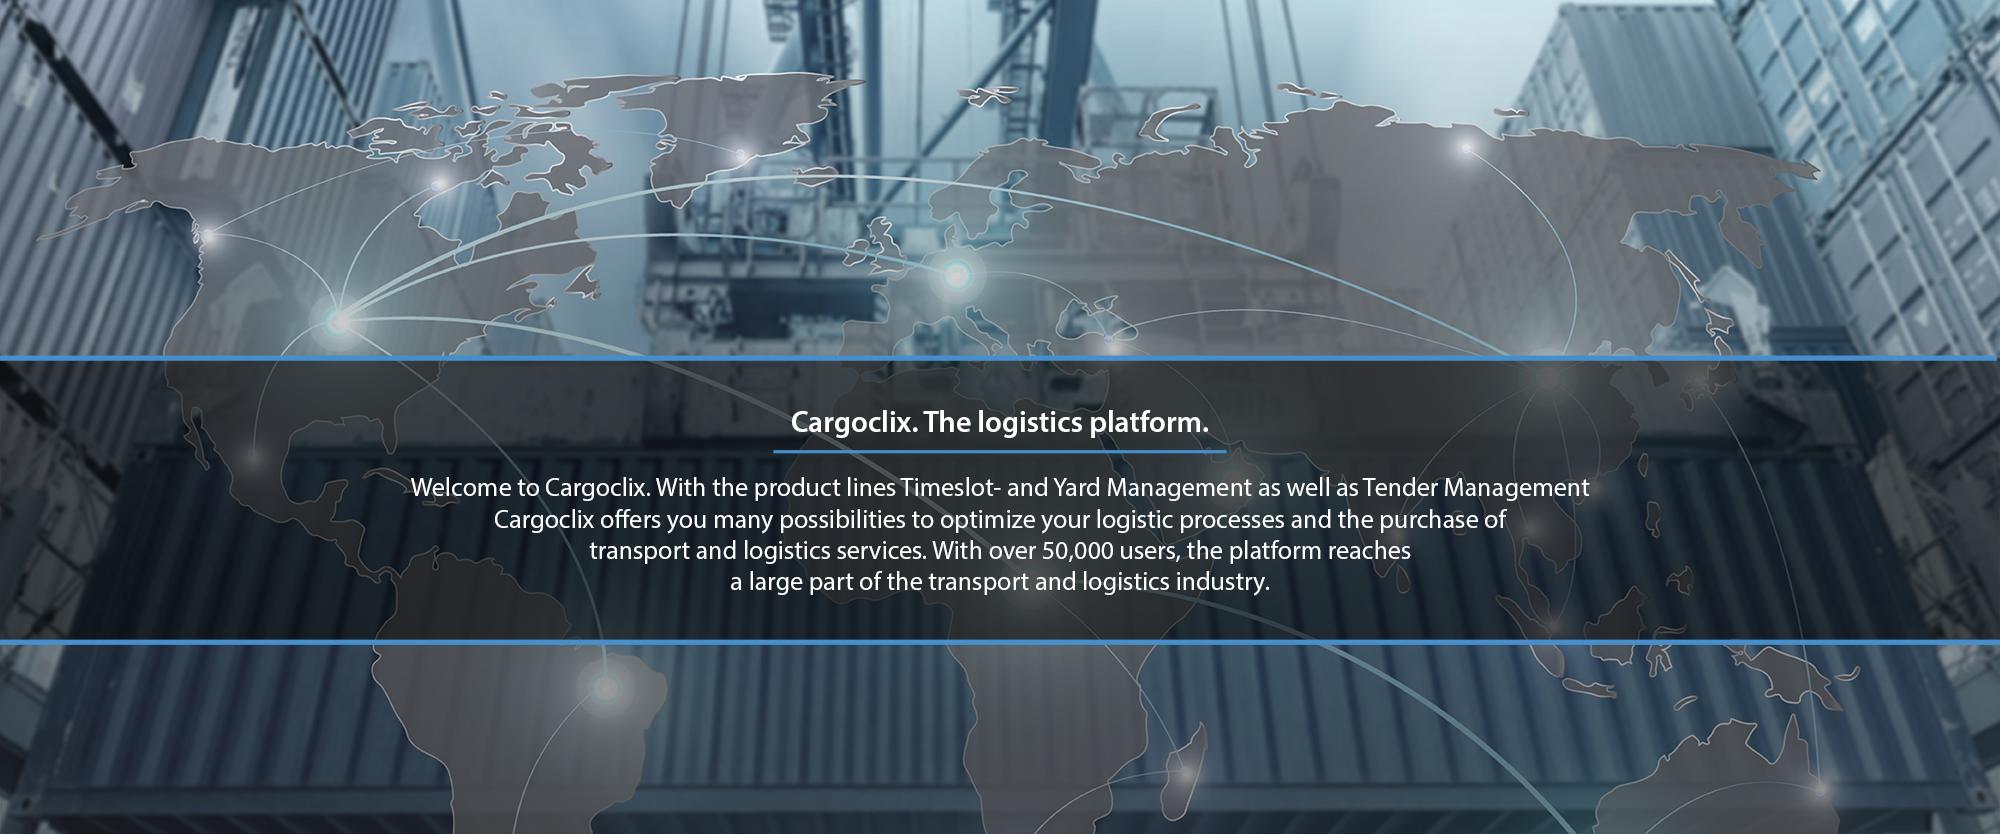 Tendering Platform and Time Slot Management System I Cargoclix